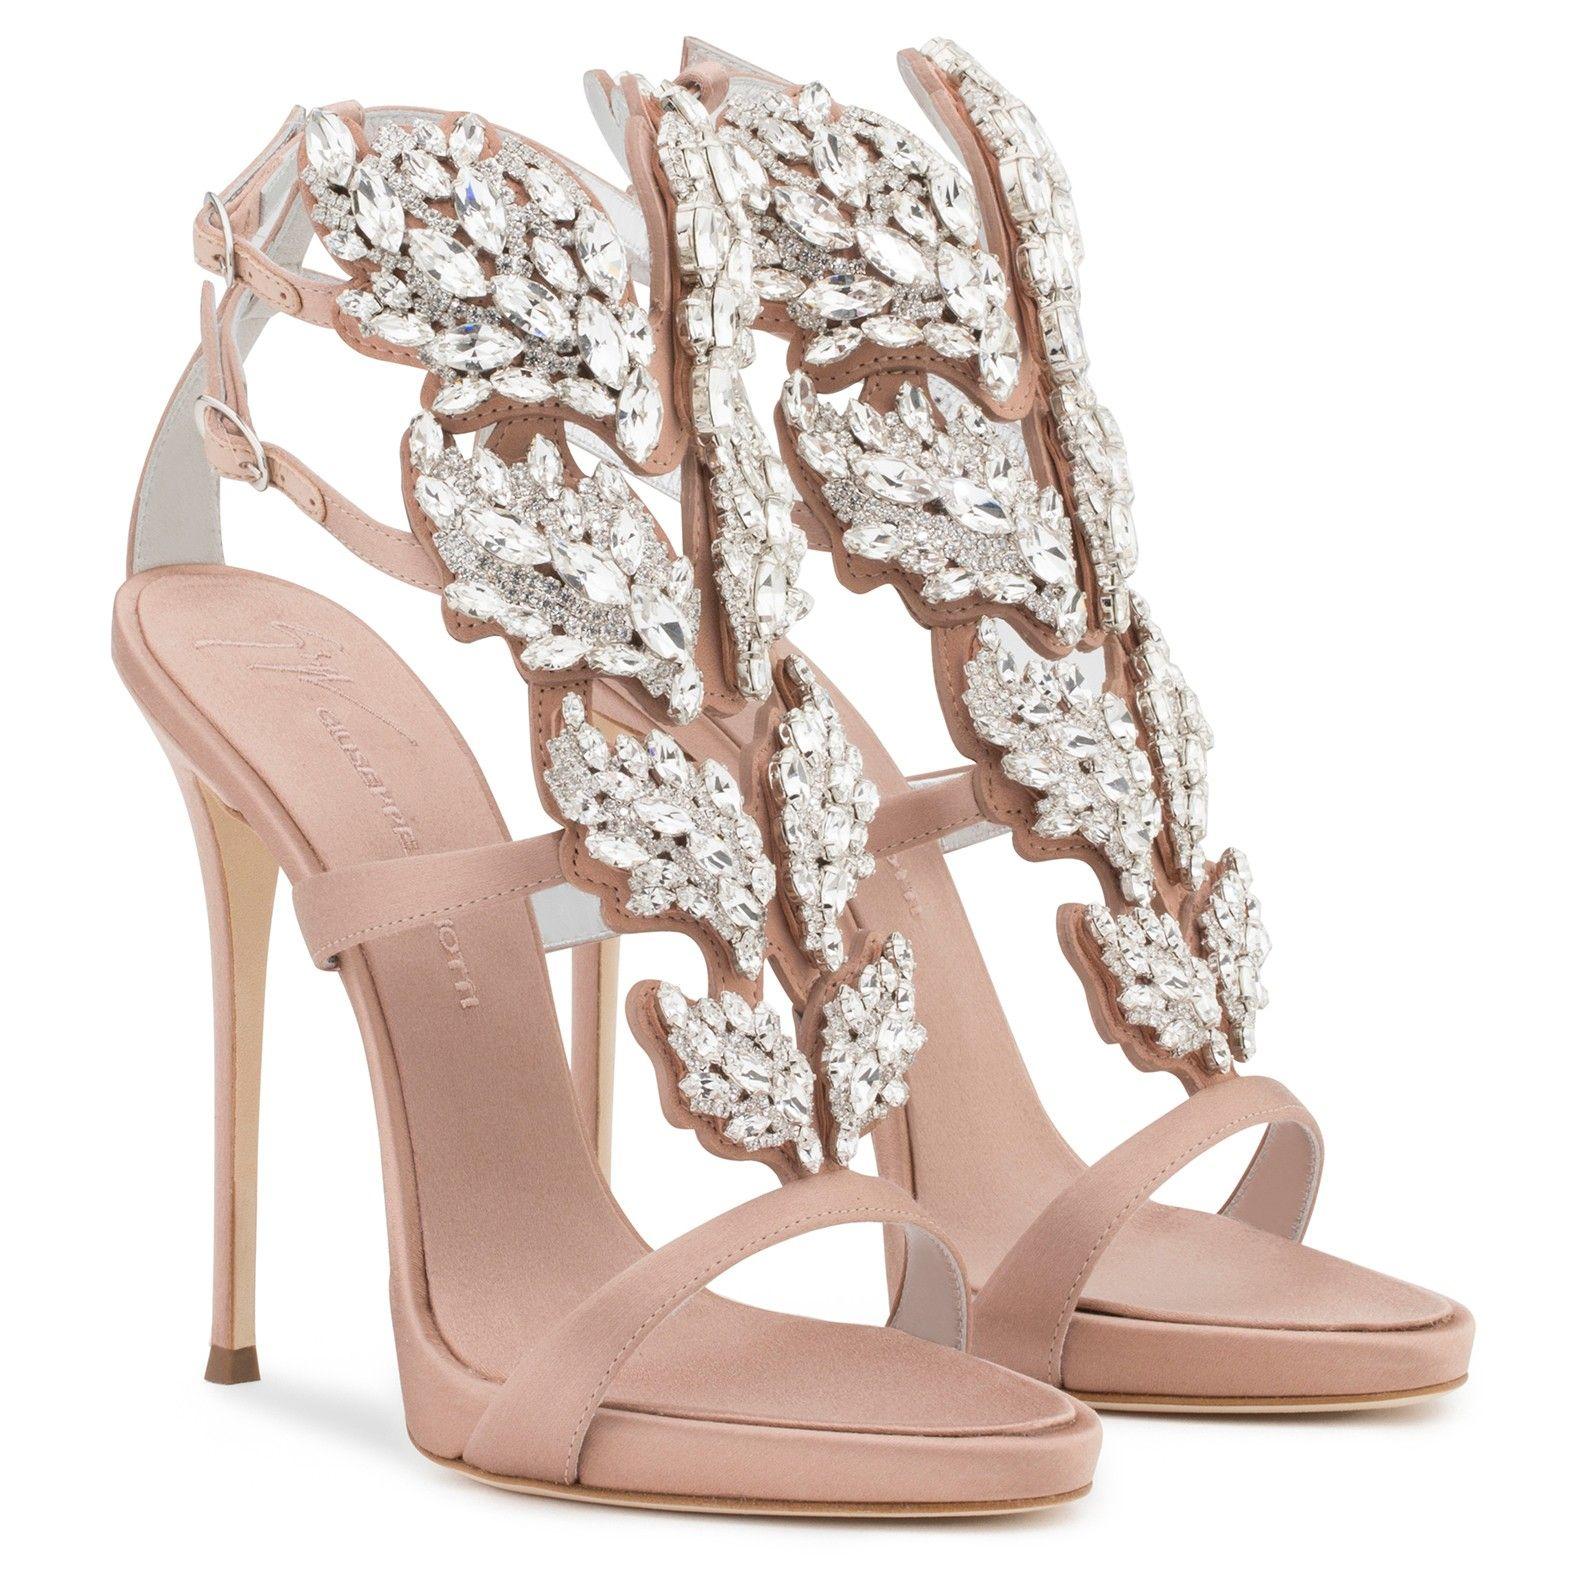 Giuseppe ZanottiSuede 'Cruel' sandal with crystals CRUEL SPARKLE y9wyBgCl